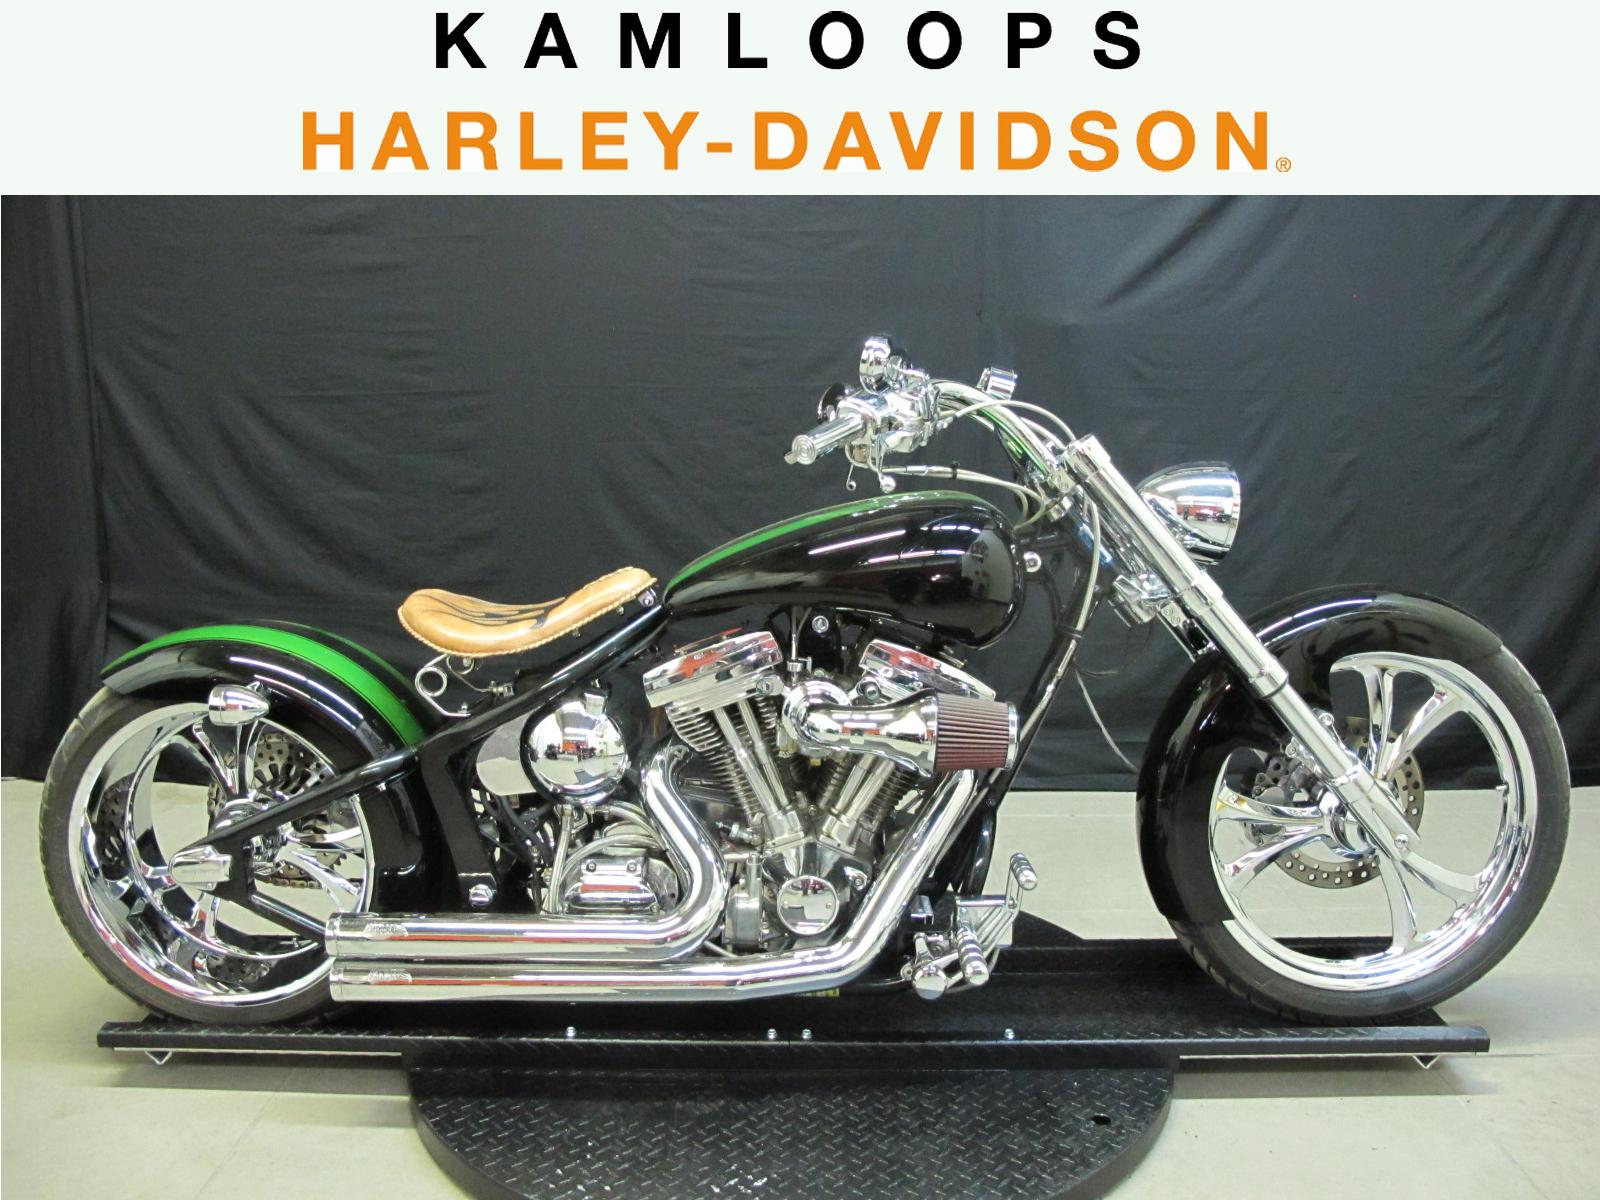 Nissan Dealer Milwaukee Harley Davidson 110th Anniversary In Milwaukee Milwaukee ...